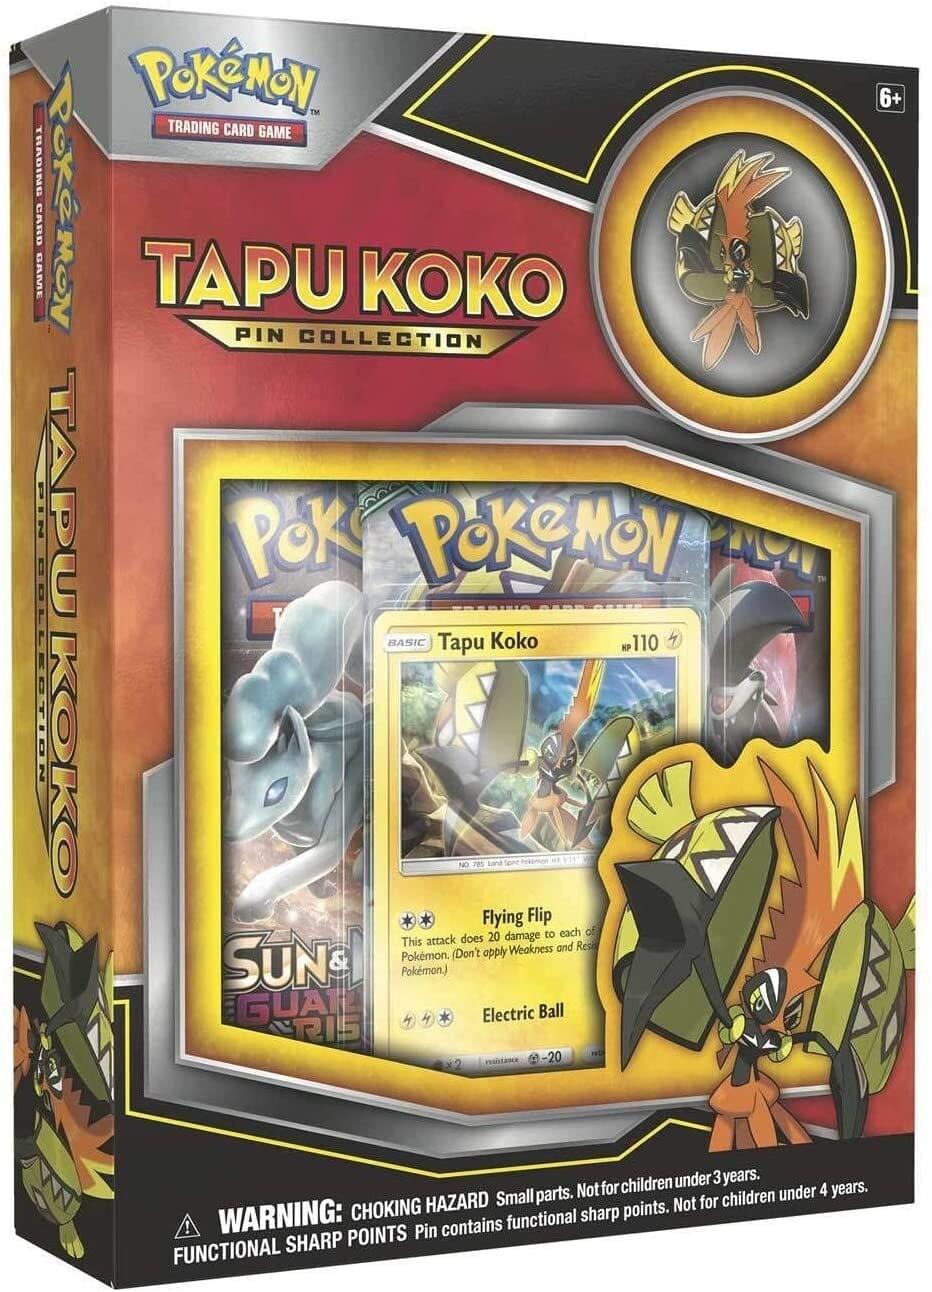 Pokemon Tapu Koko Pin Collection Box